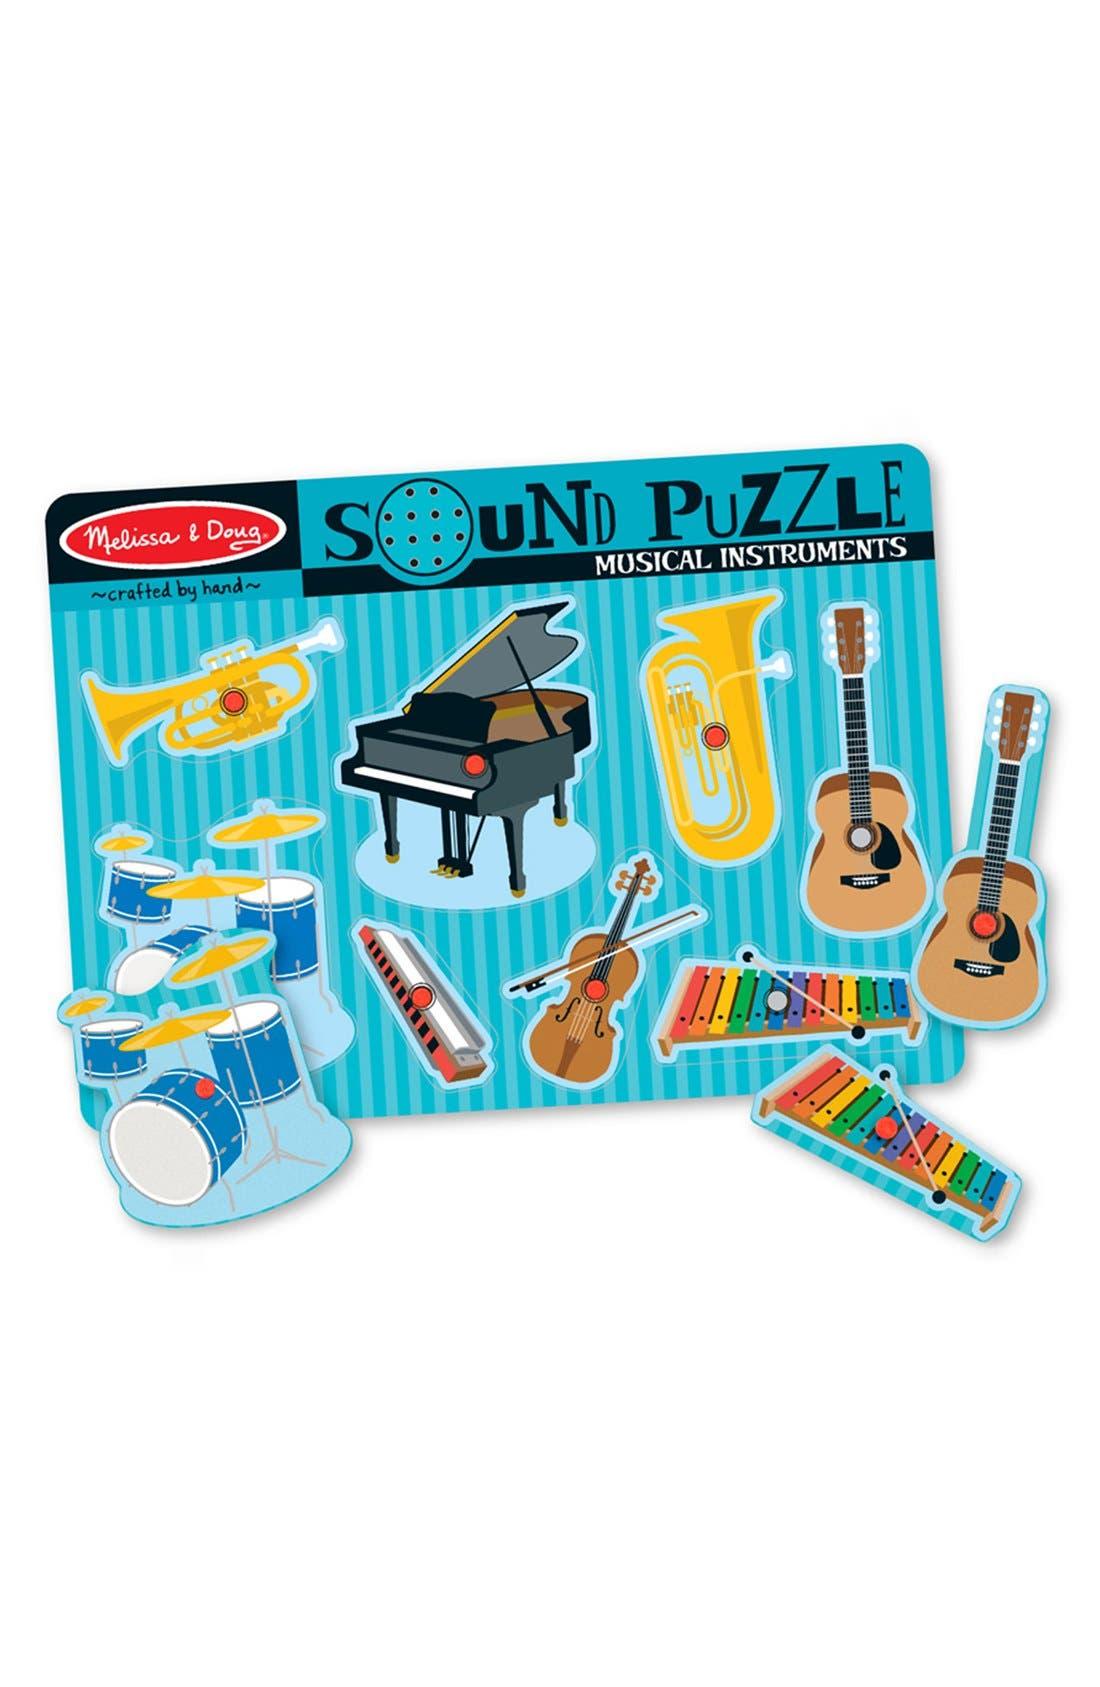 'Musical Instruments' Sound Puzzle,                             Main thumbnail 1, color,                             BLUE